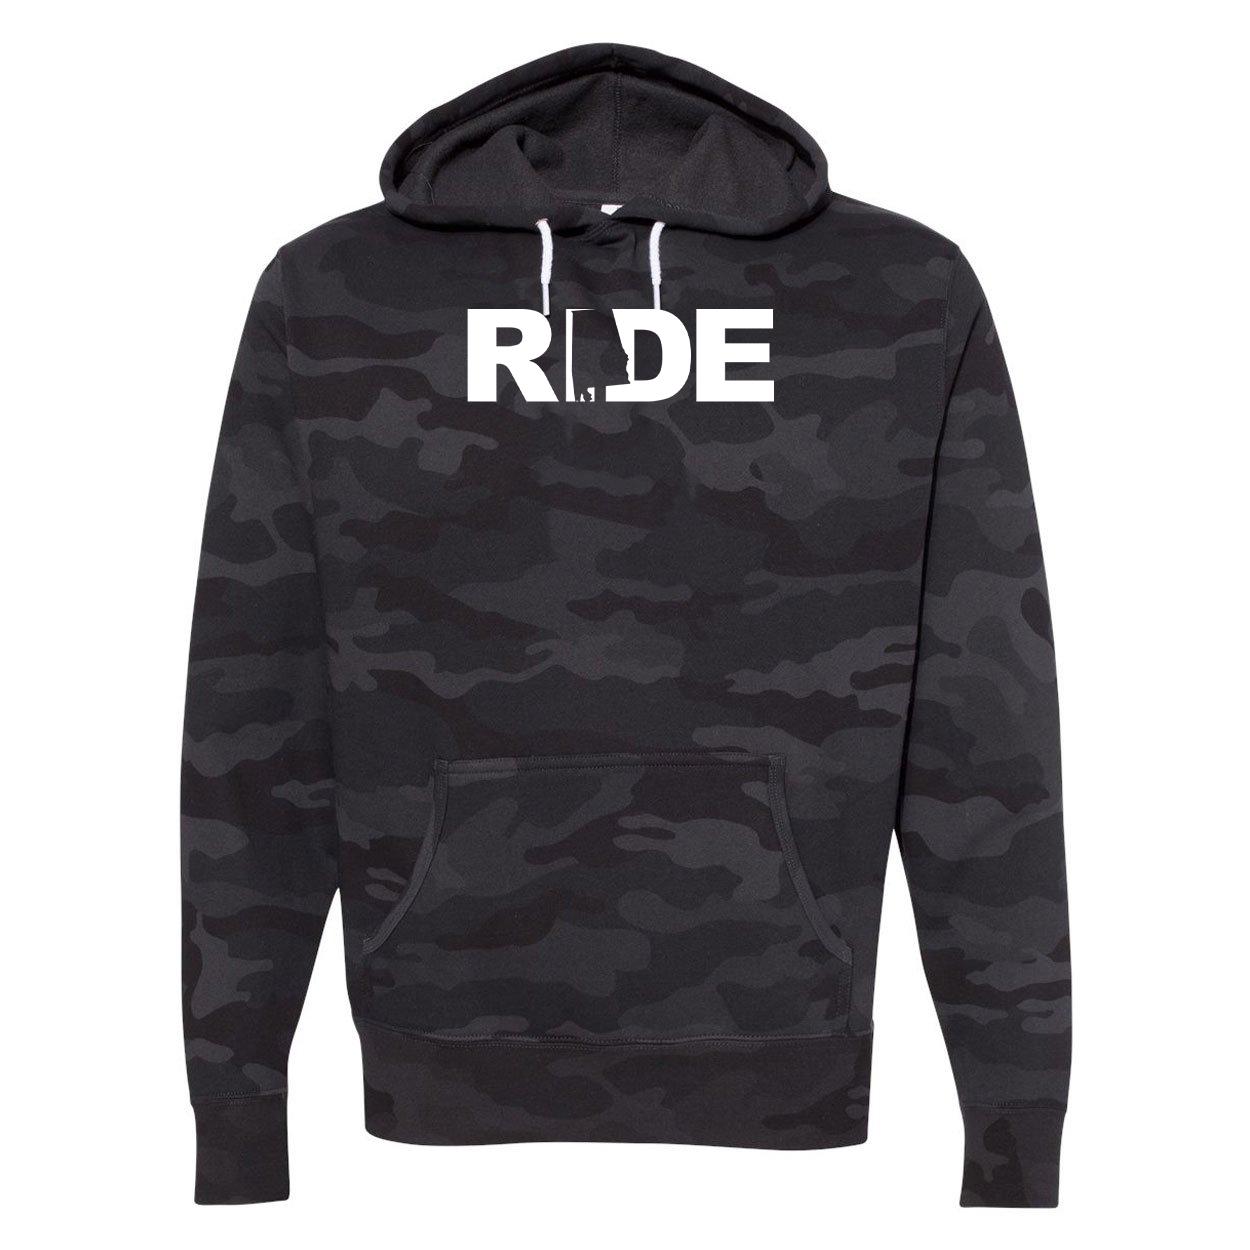 Ride Alabama Classic Unisex Hooded Sweatshirt Black Camo (White Logo)